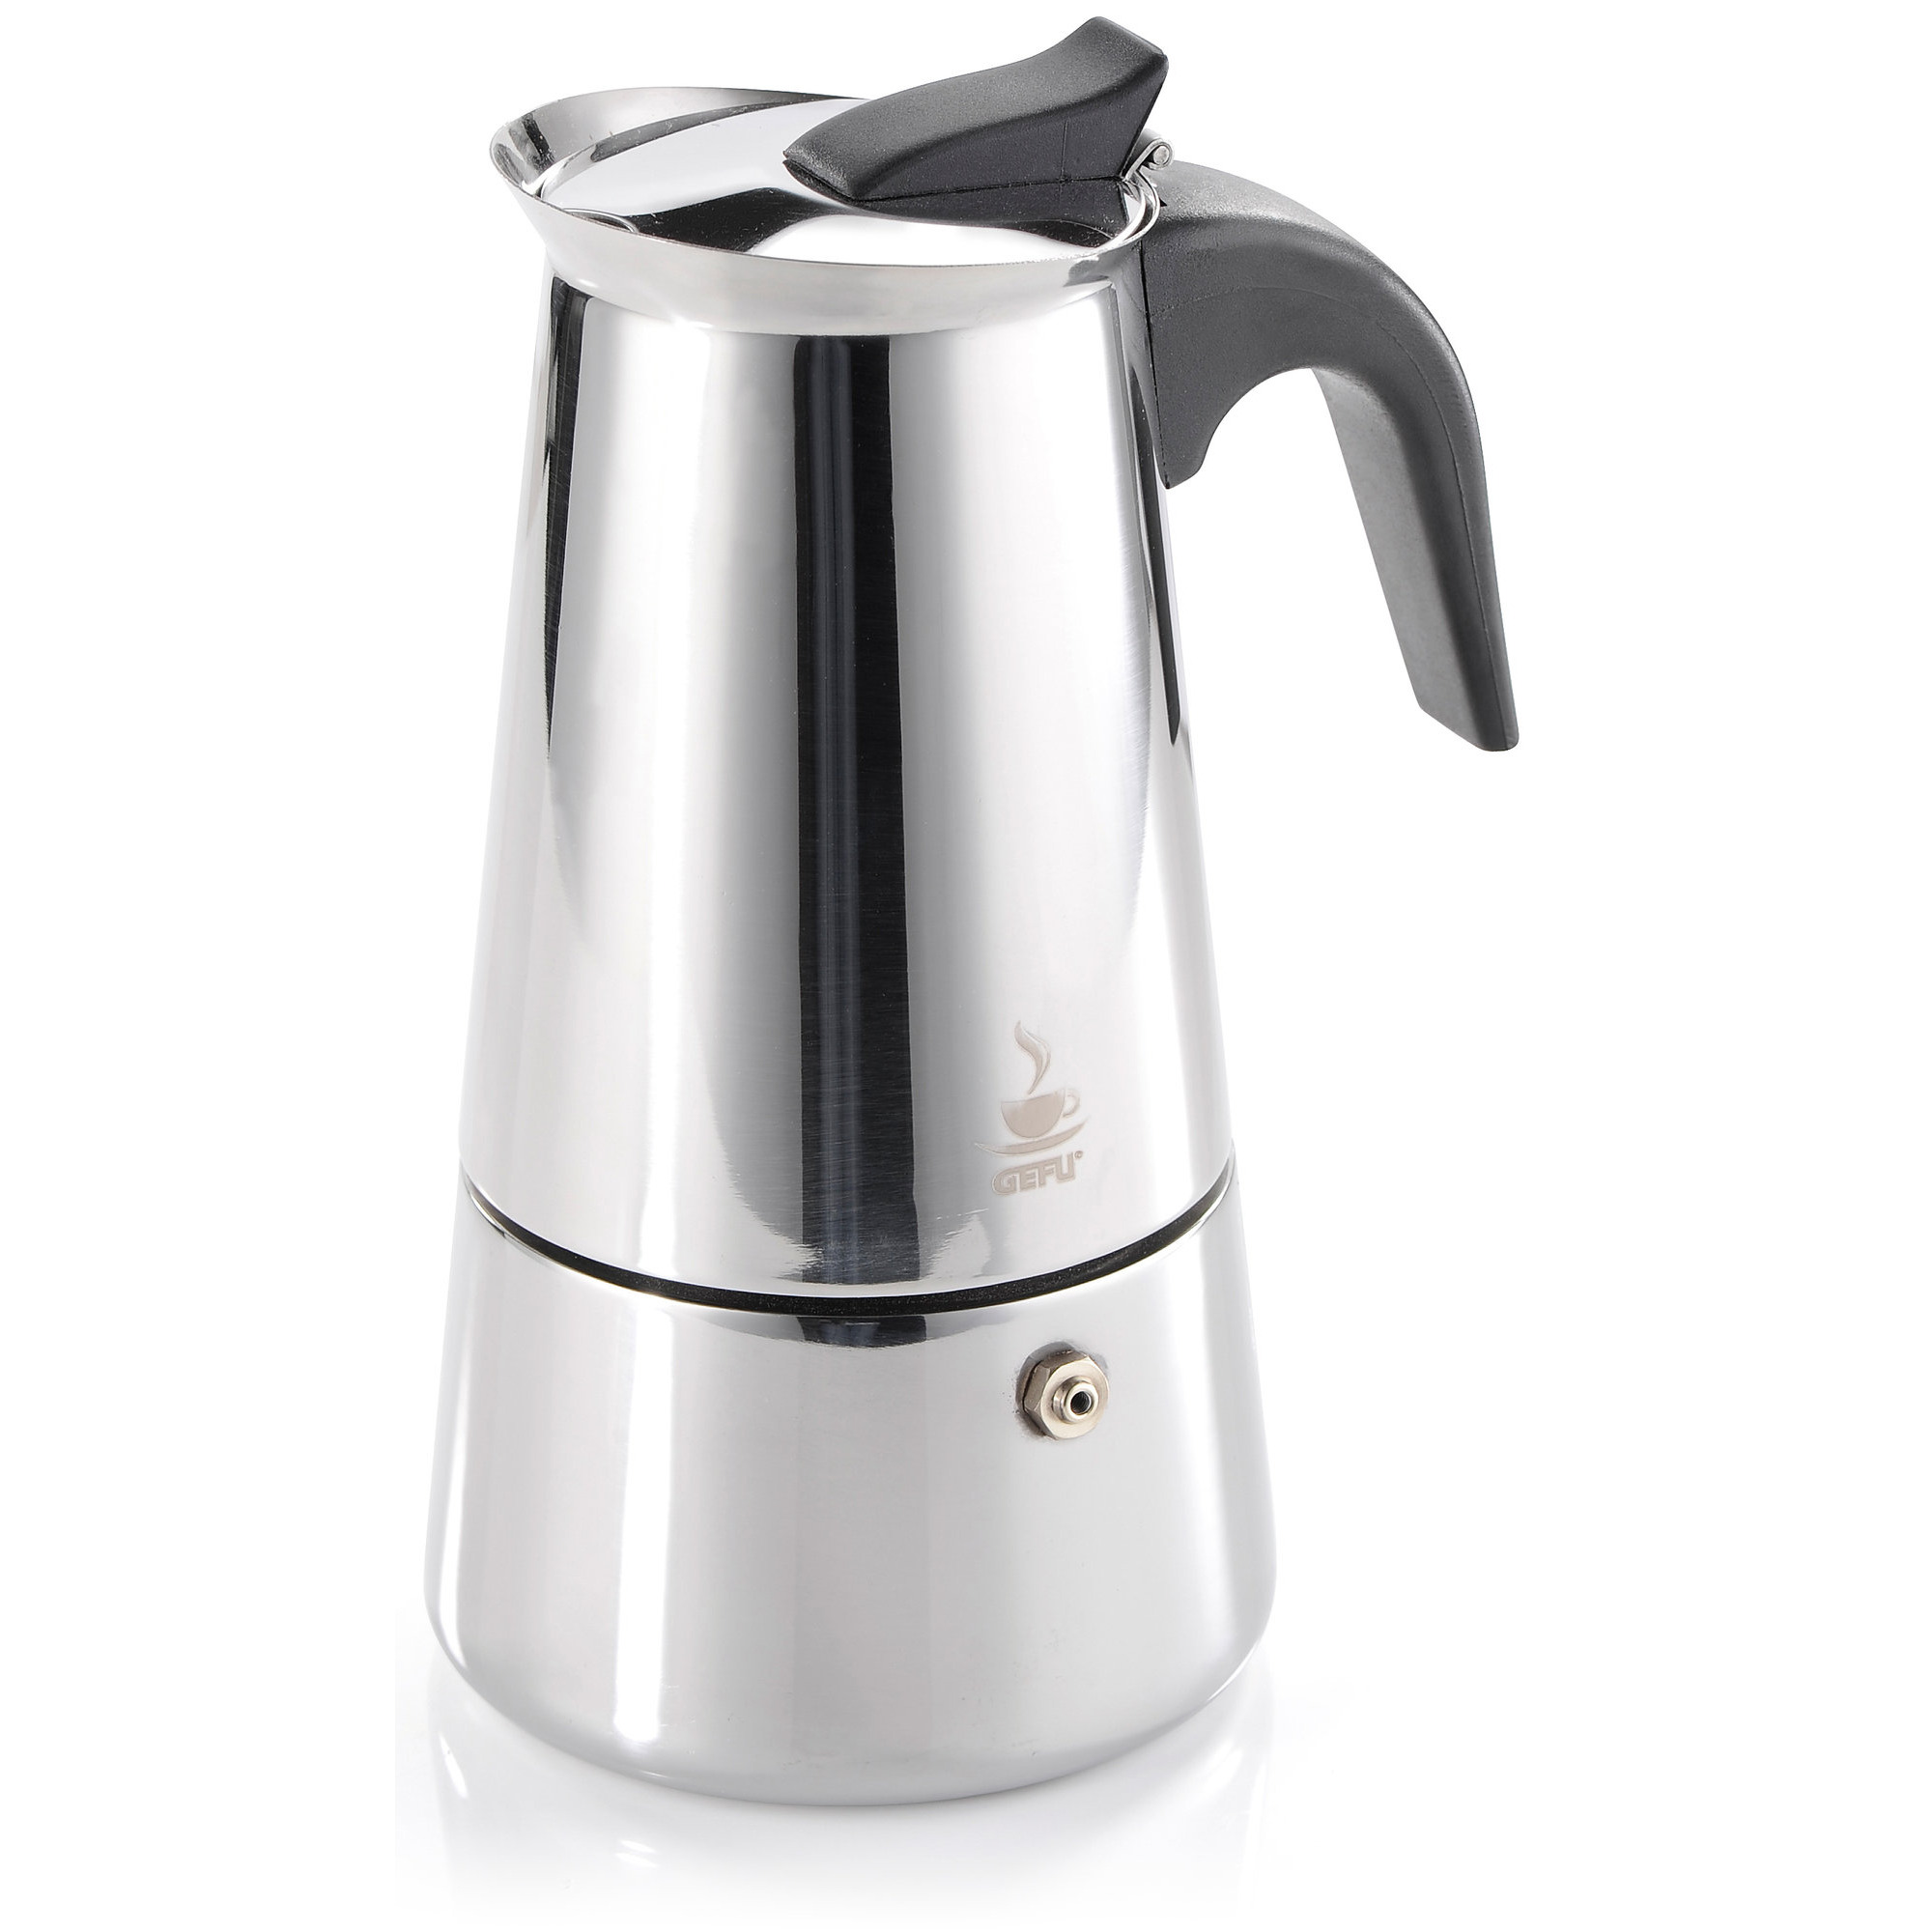 GEFU Espressokanna till kokplatta